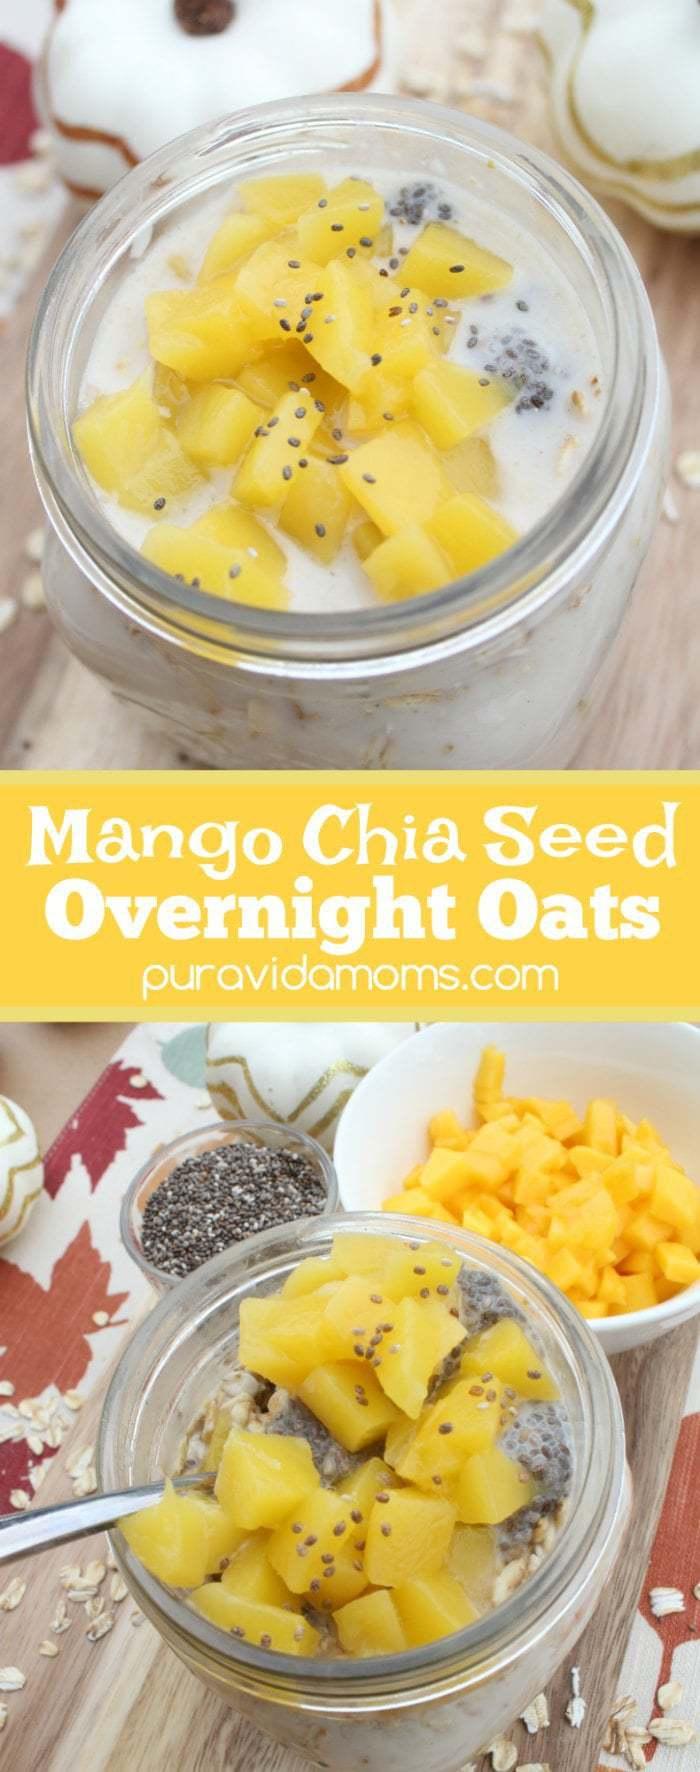 Mango Chia Seed Overnight Oats Recipe